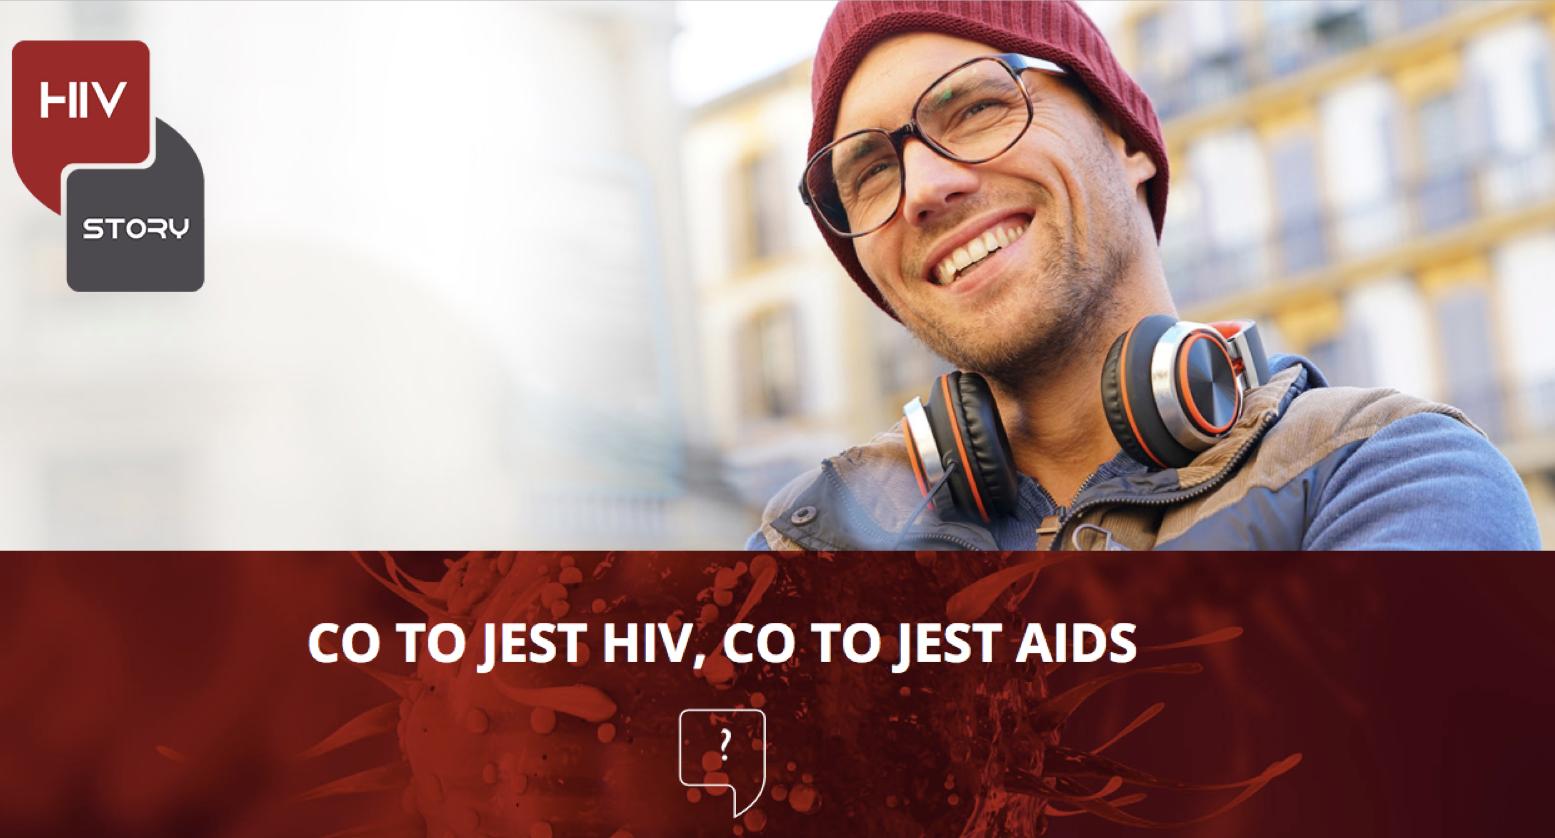 HIV STORY